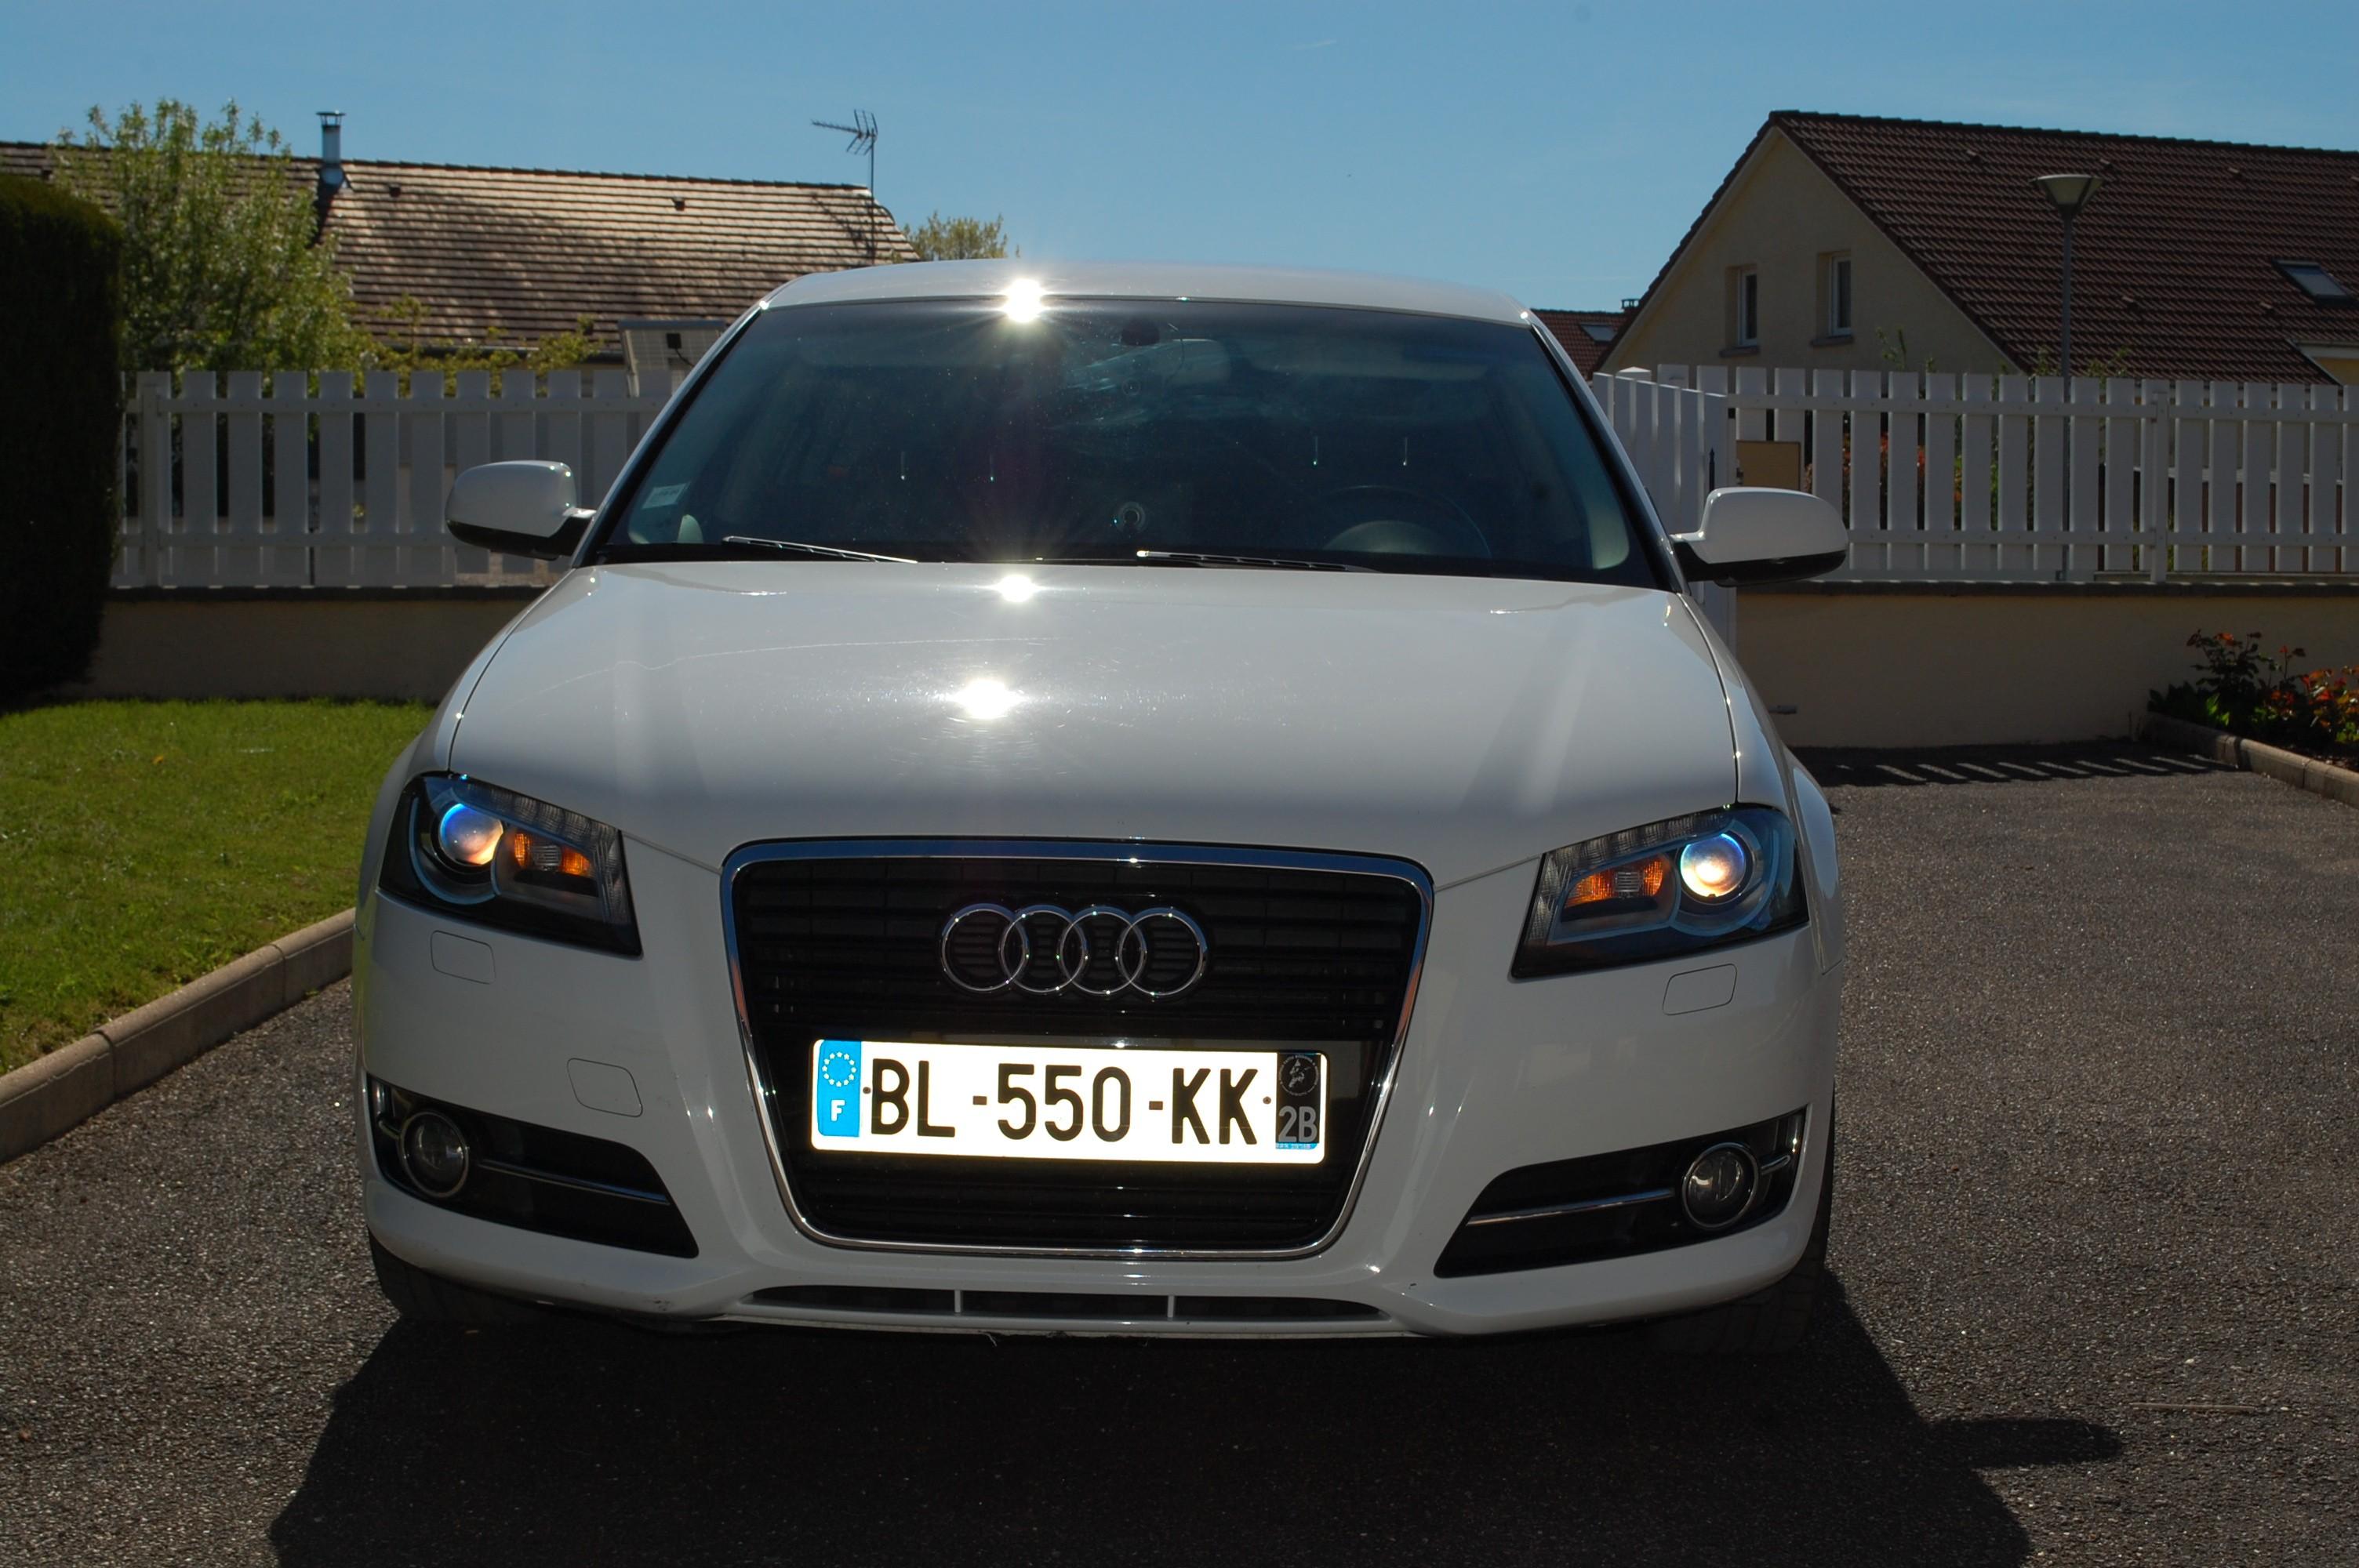 Audi A3 Sportback Diesel Manuelle 2011 luxeuil